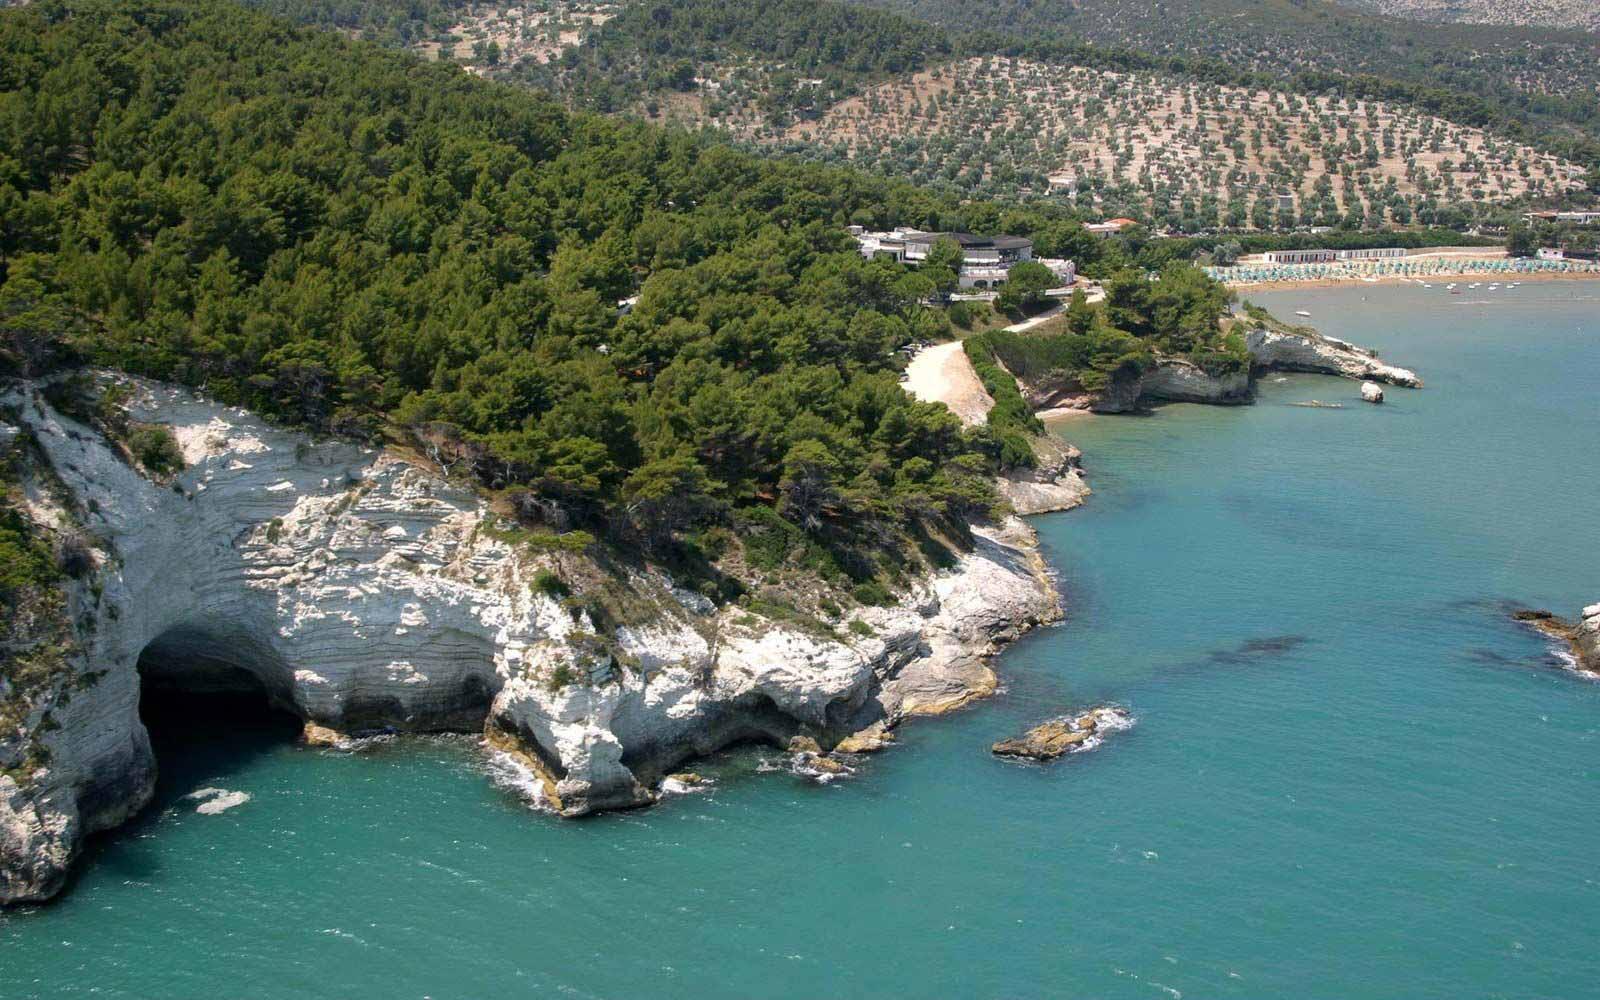 nearby views of Gattarella Resort